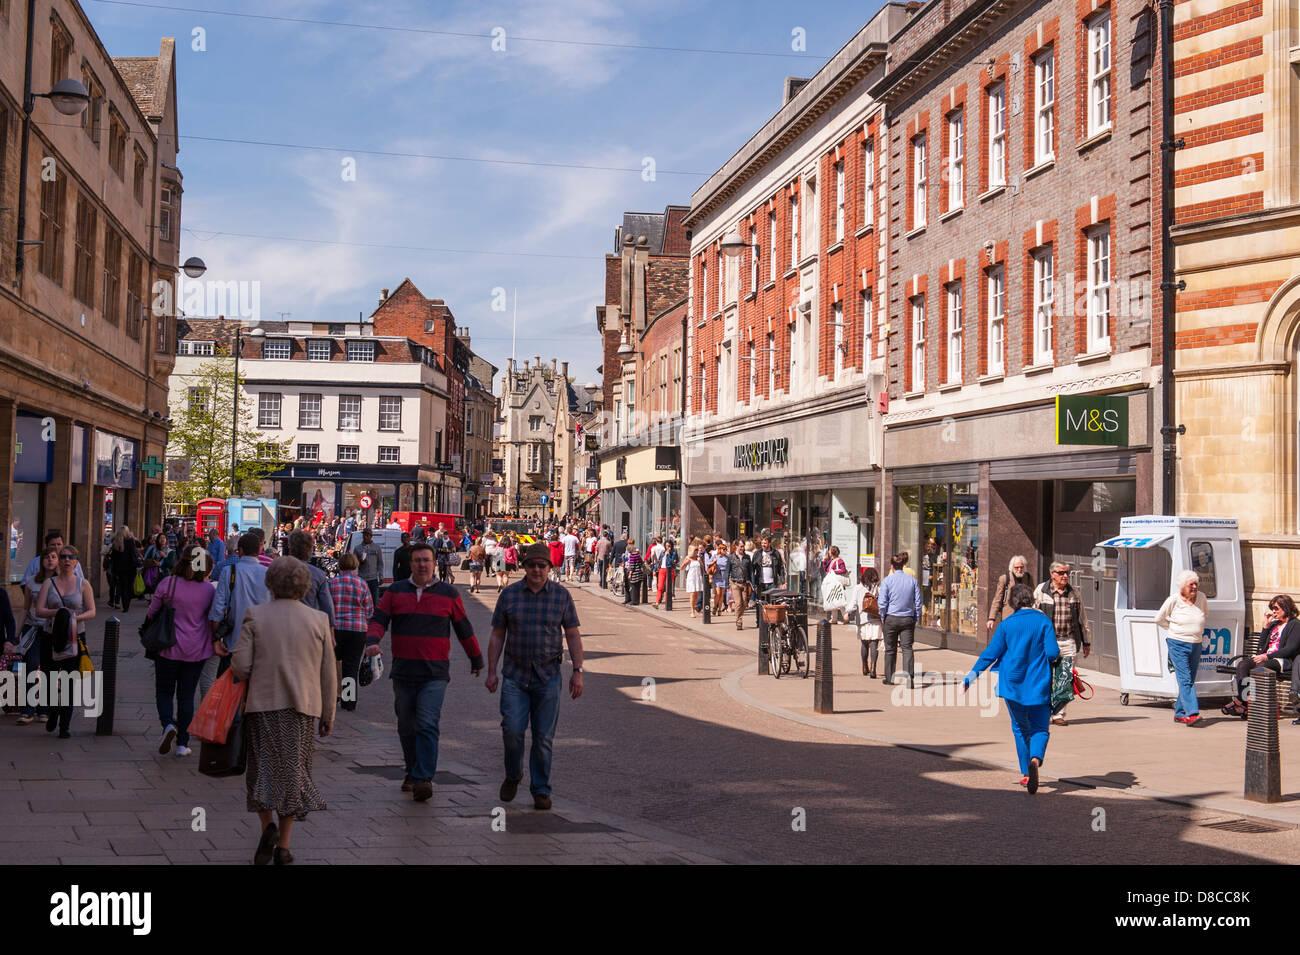 The city centre in Cambridge, England, Britain, Uk - Stock Image